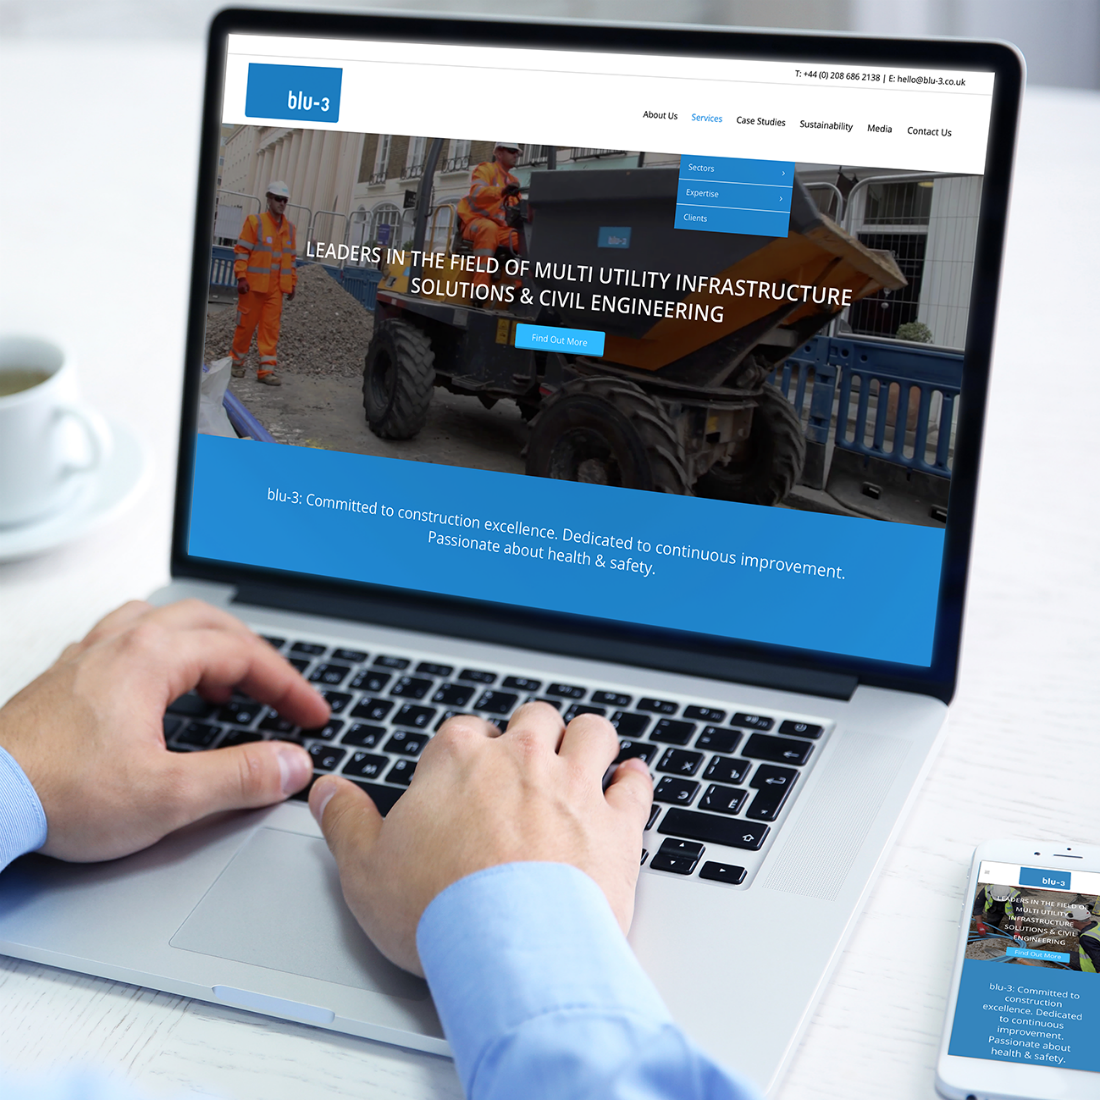 blu-3 website